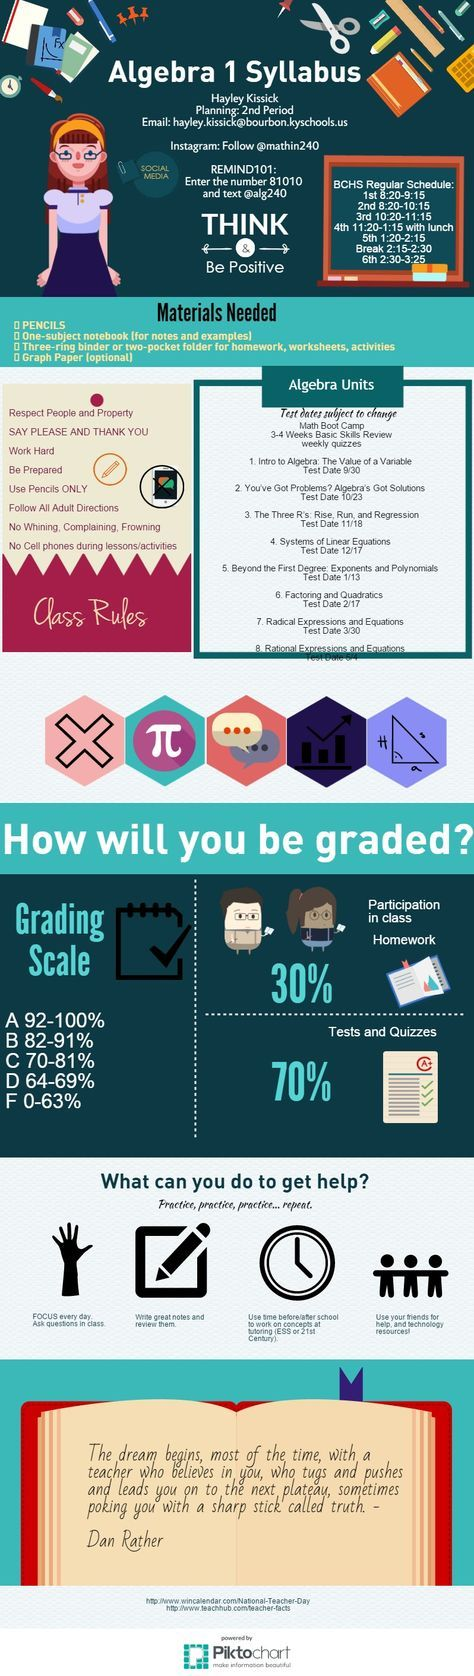 Algebra 1 Syllabus   @Piktochart Infographic